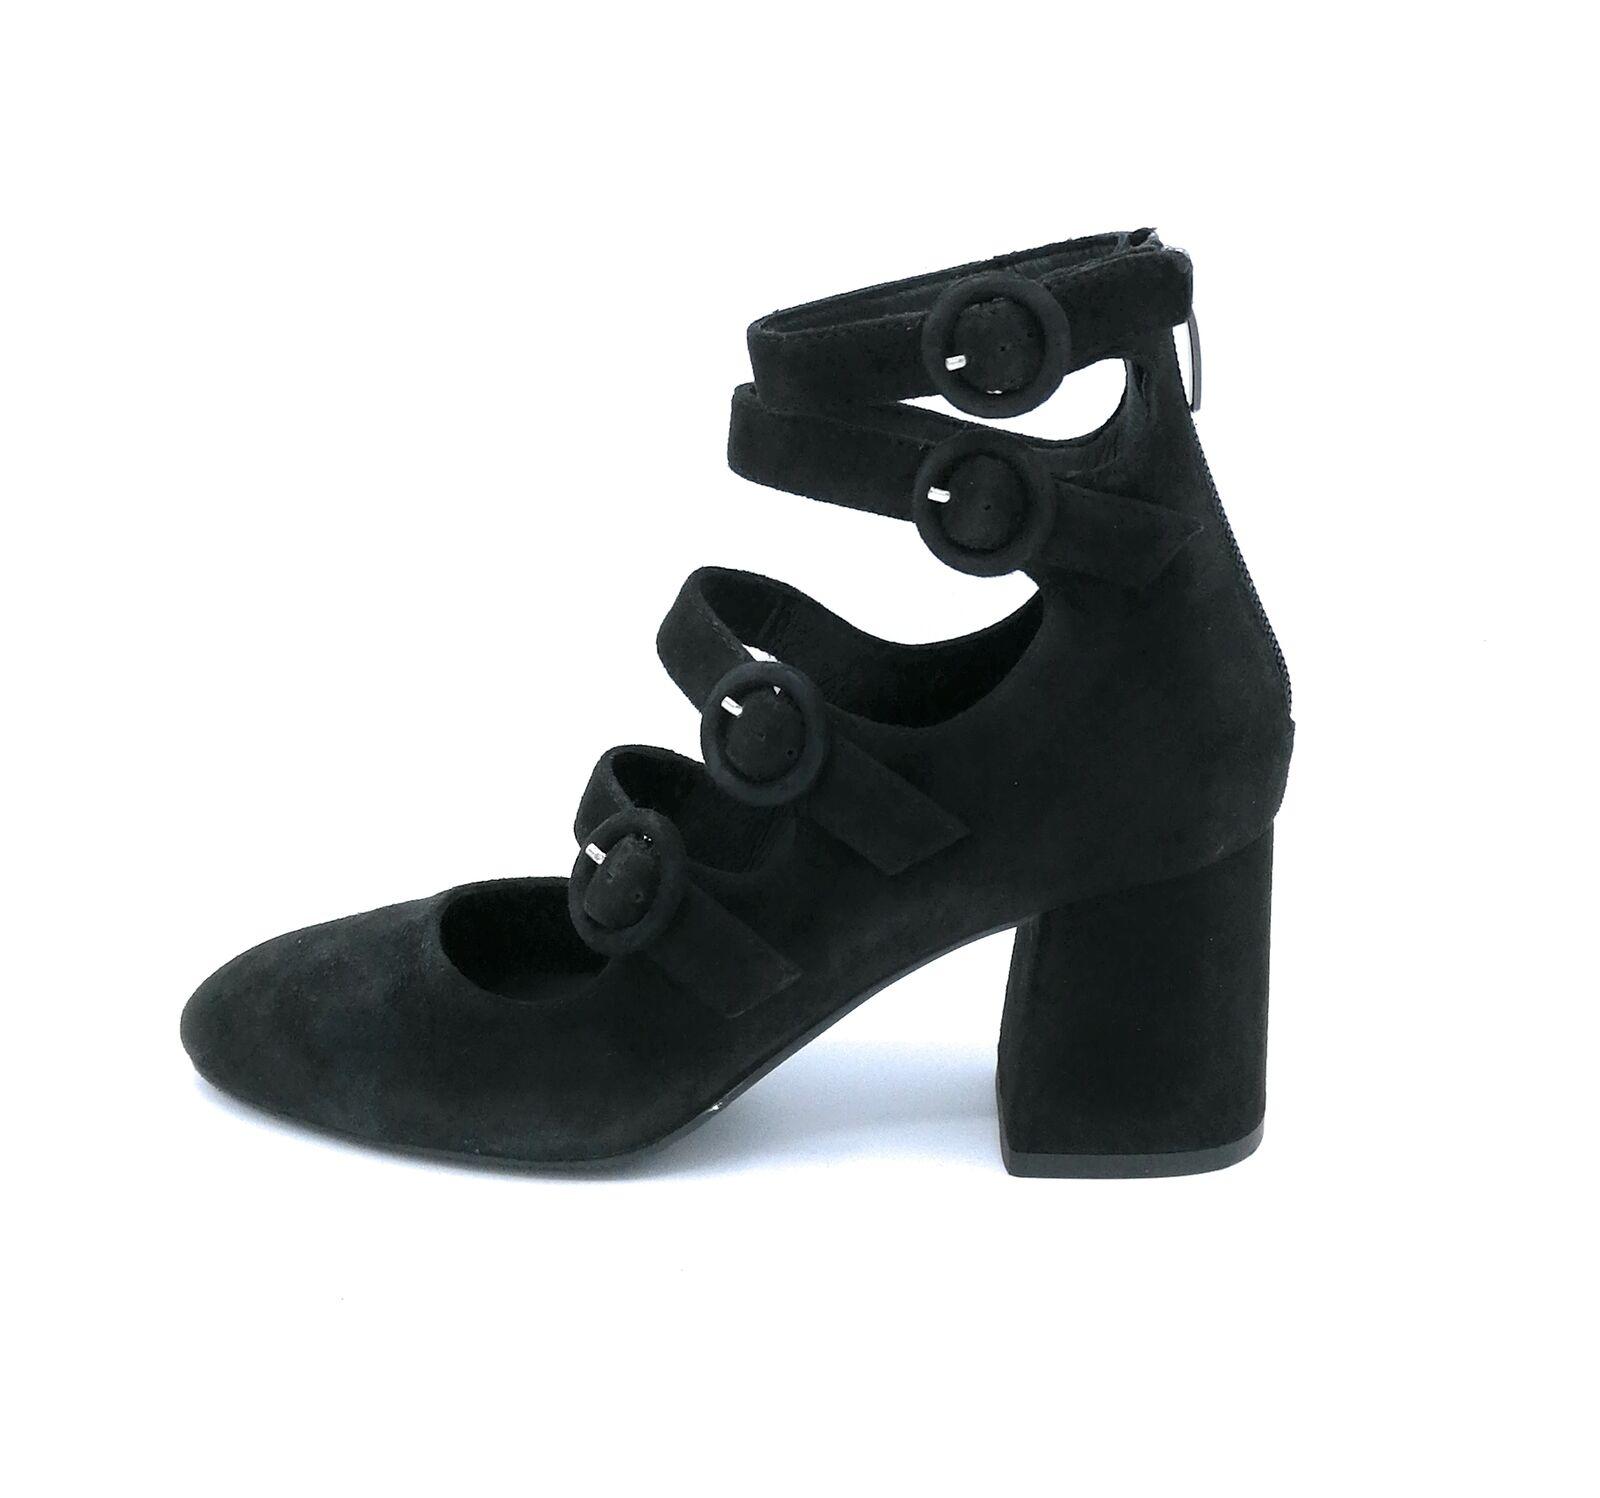 Adele Dezotti S2103 stivaletto camoscio noir cinturini tacco 6 cm